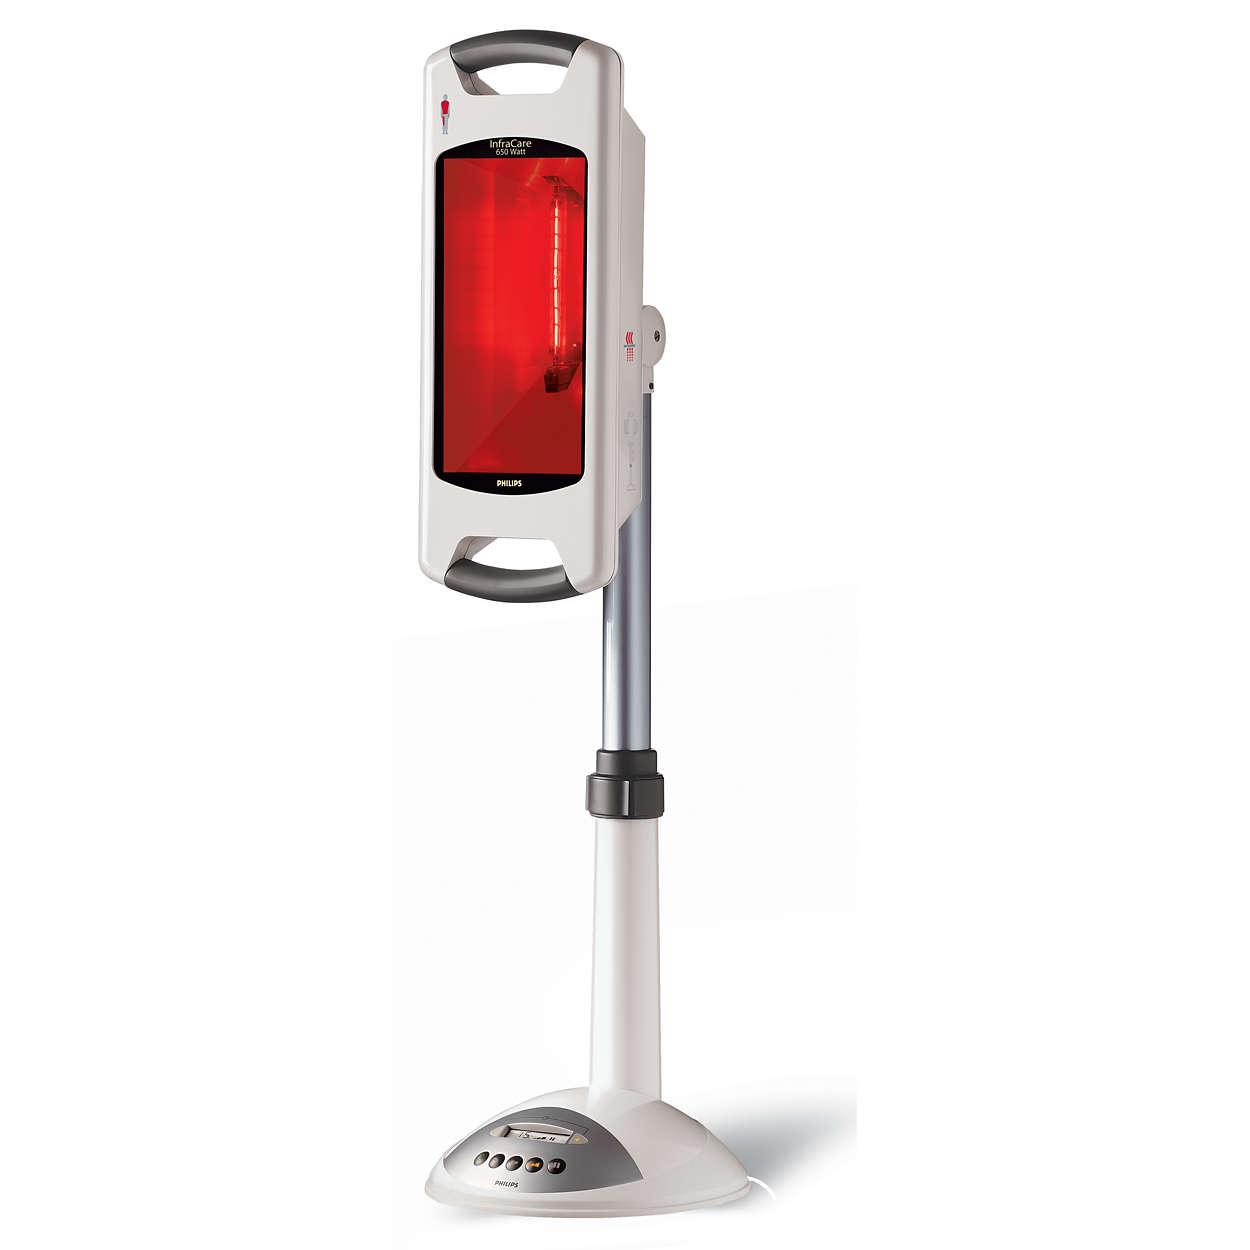 PHILIPS INFRACARE ROTLAMPE 650 Watt Infrarotlampe Lampe